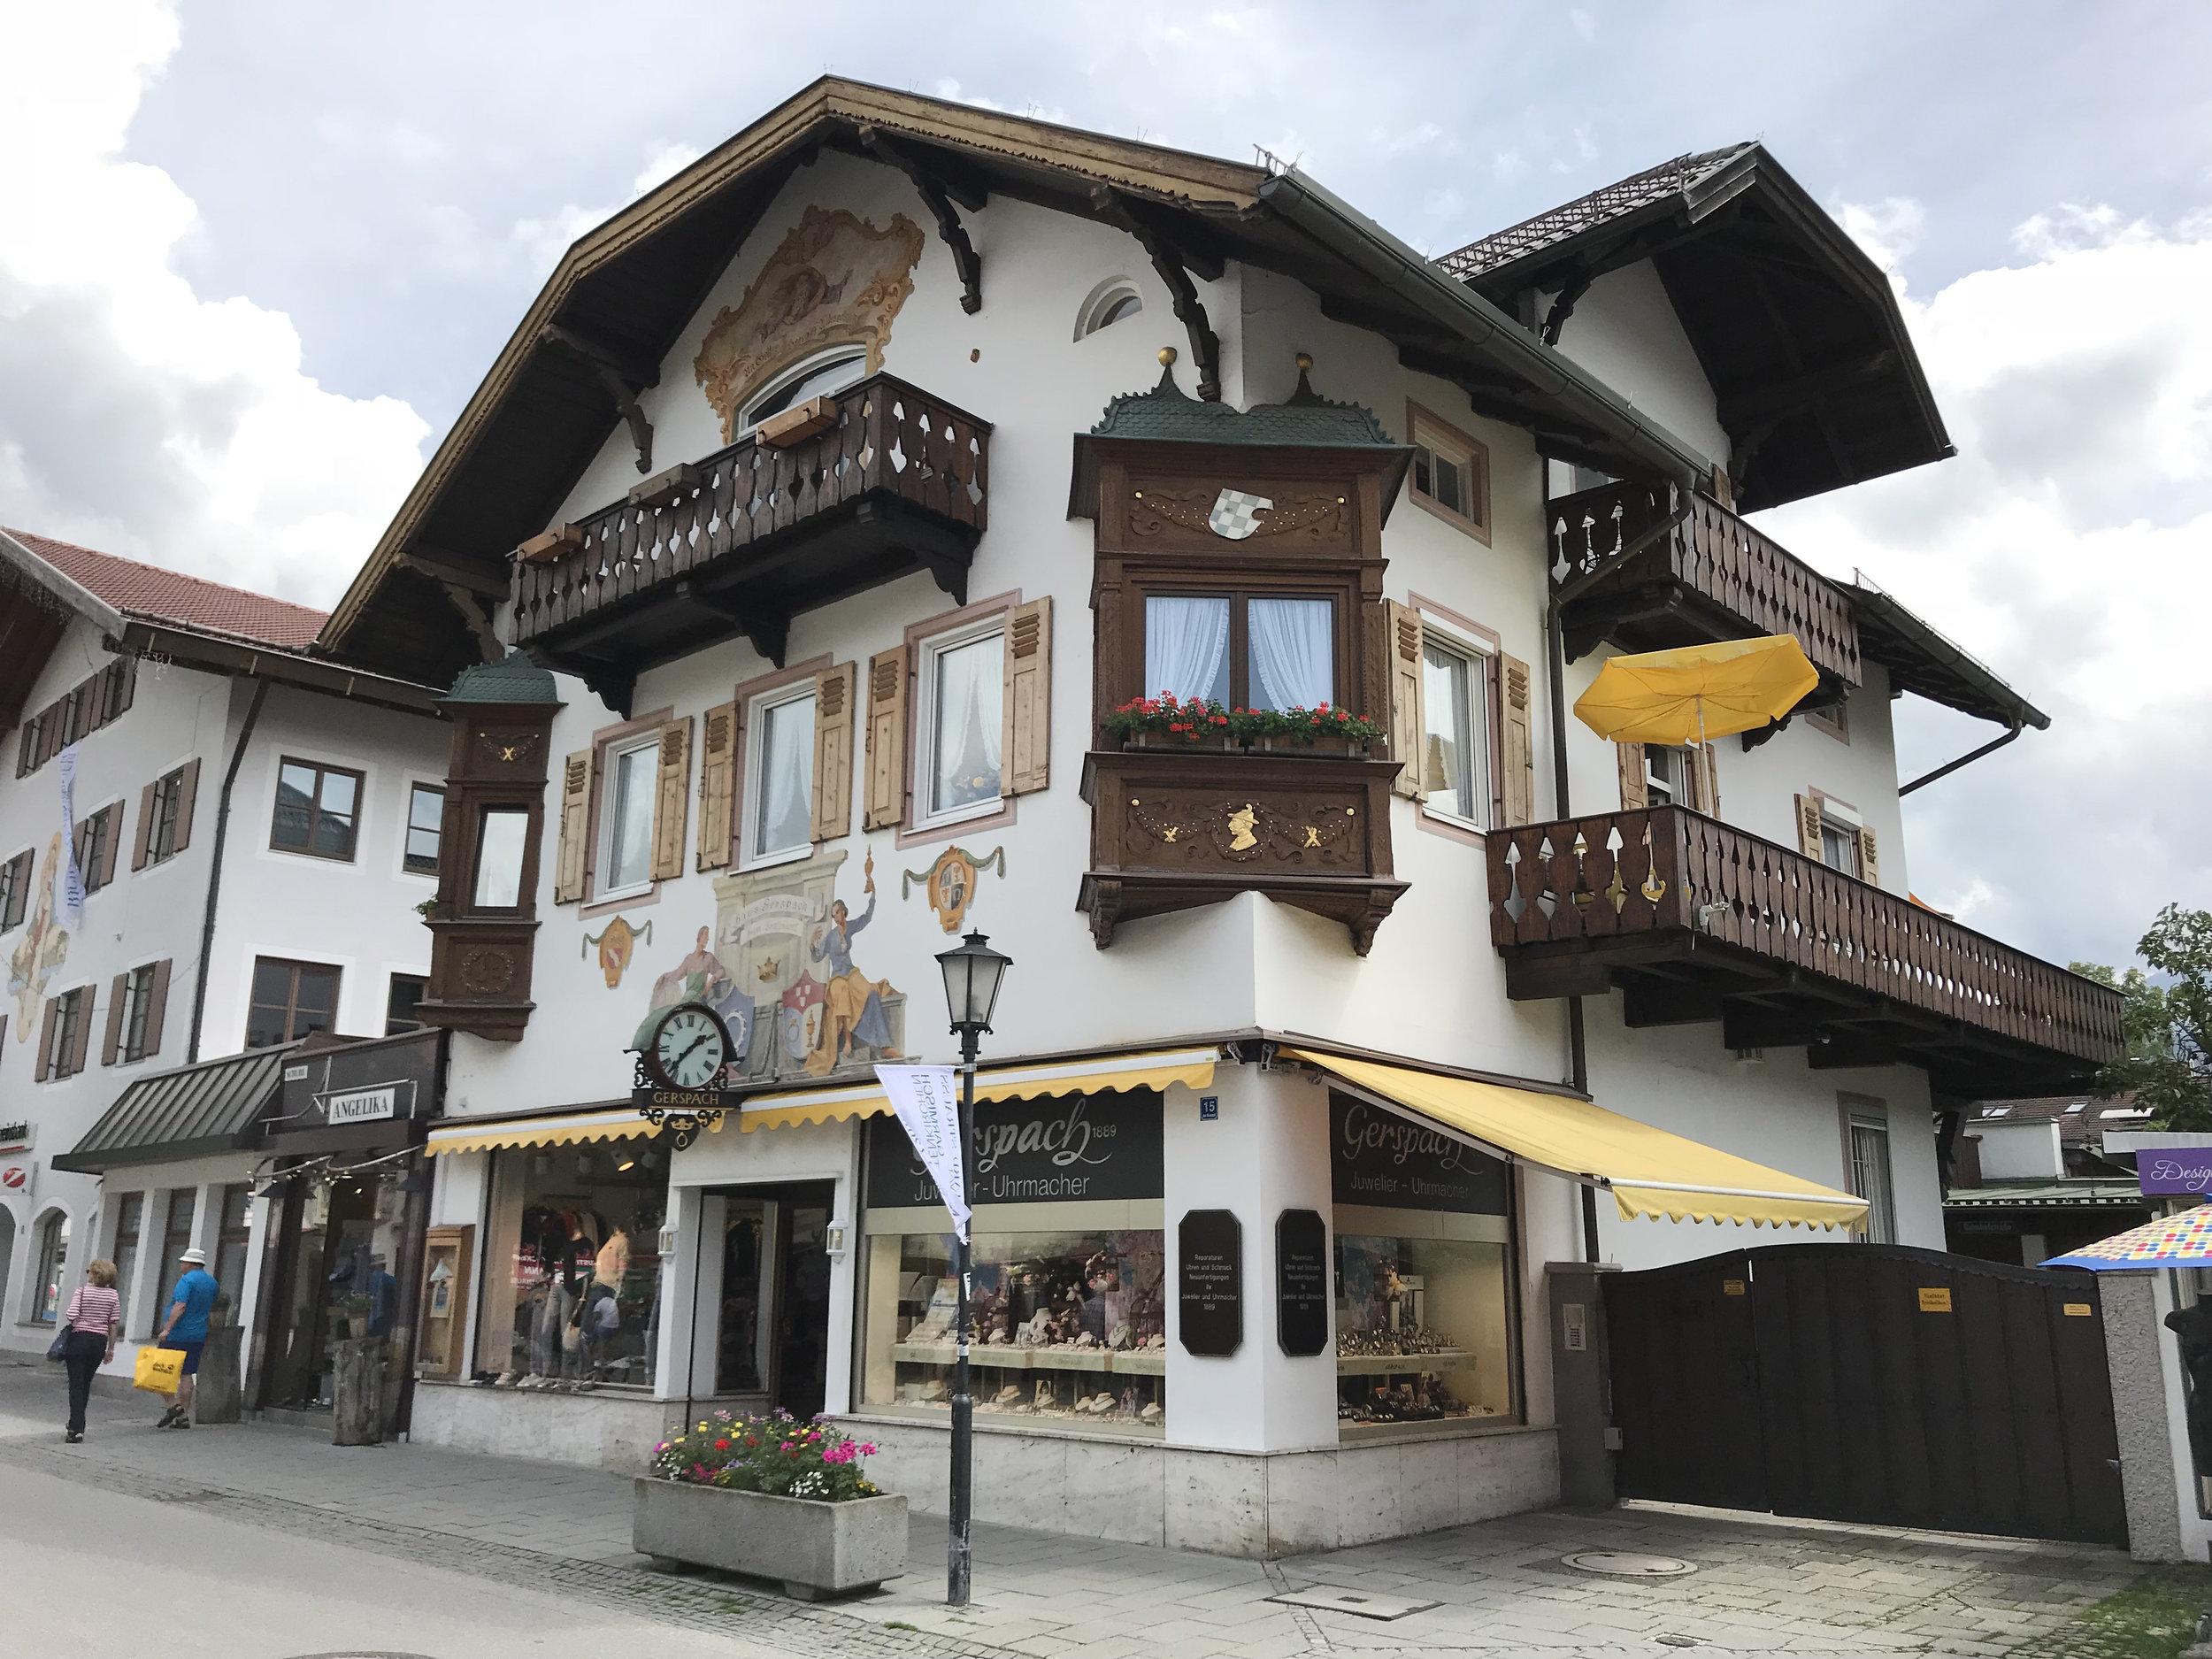 Teri_Bavaria_part3_spiritedtable_photo08.jpg